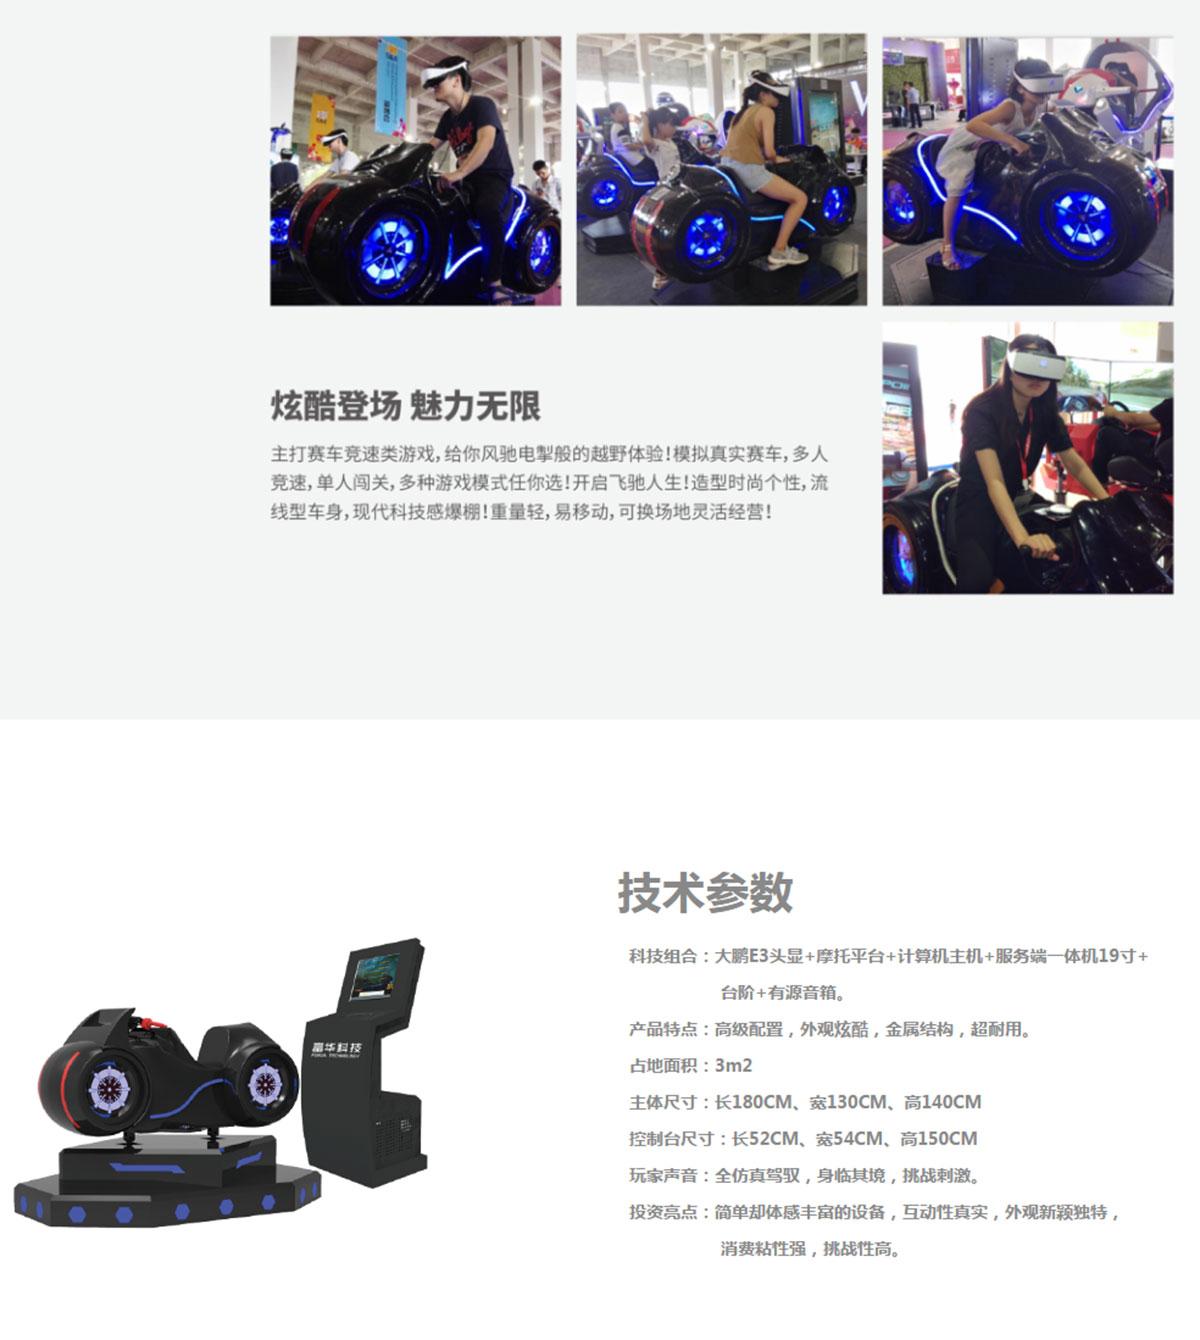 VR摩托车插图1